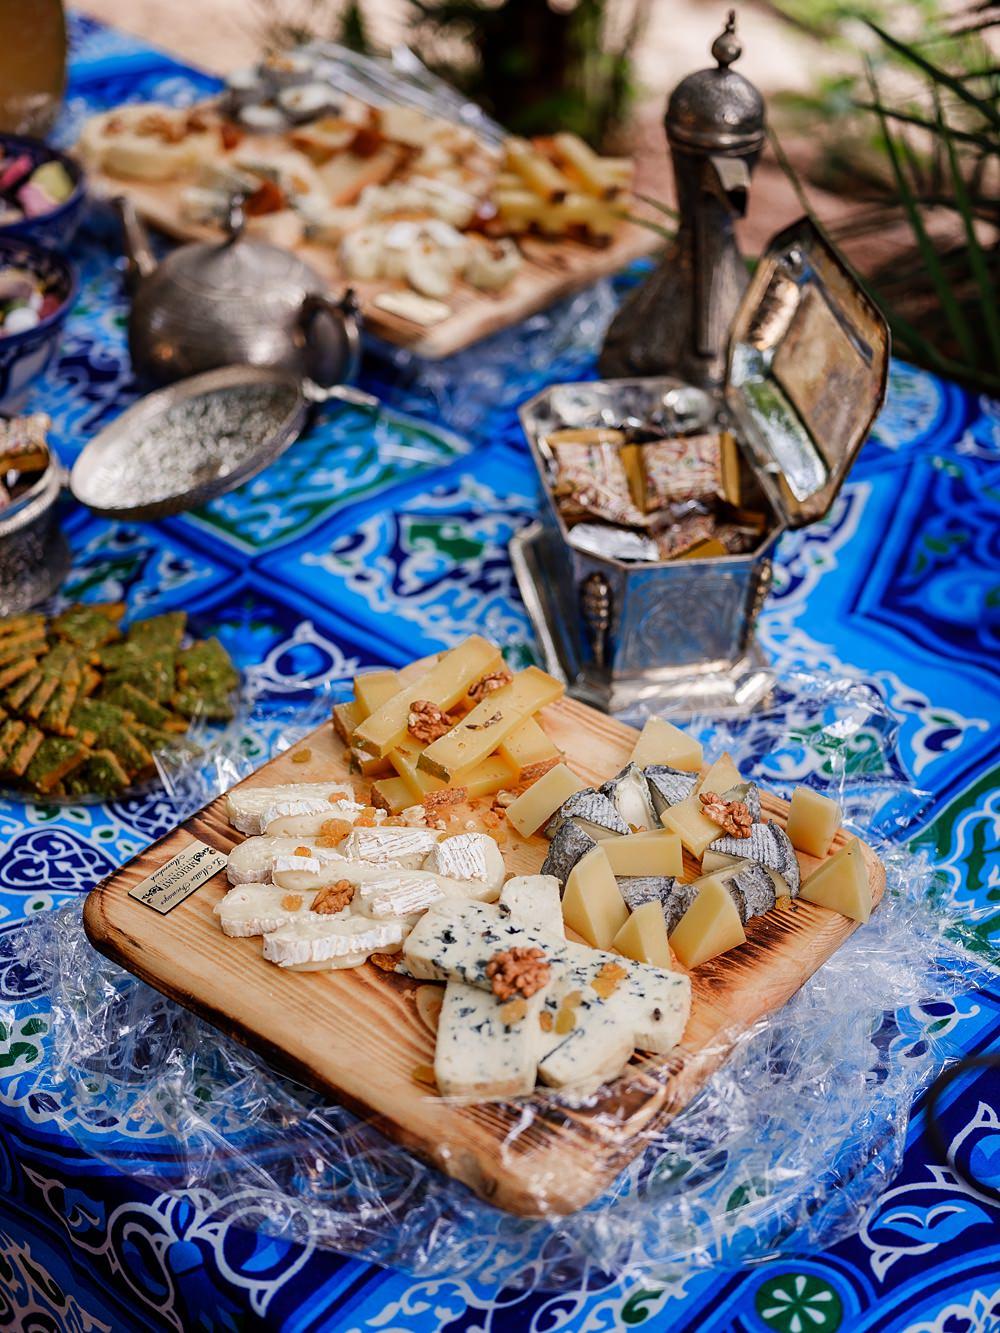 paradise destination wedding at jnane tamsna in marrakech